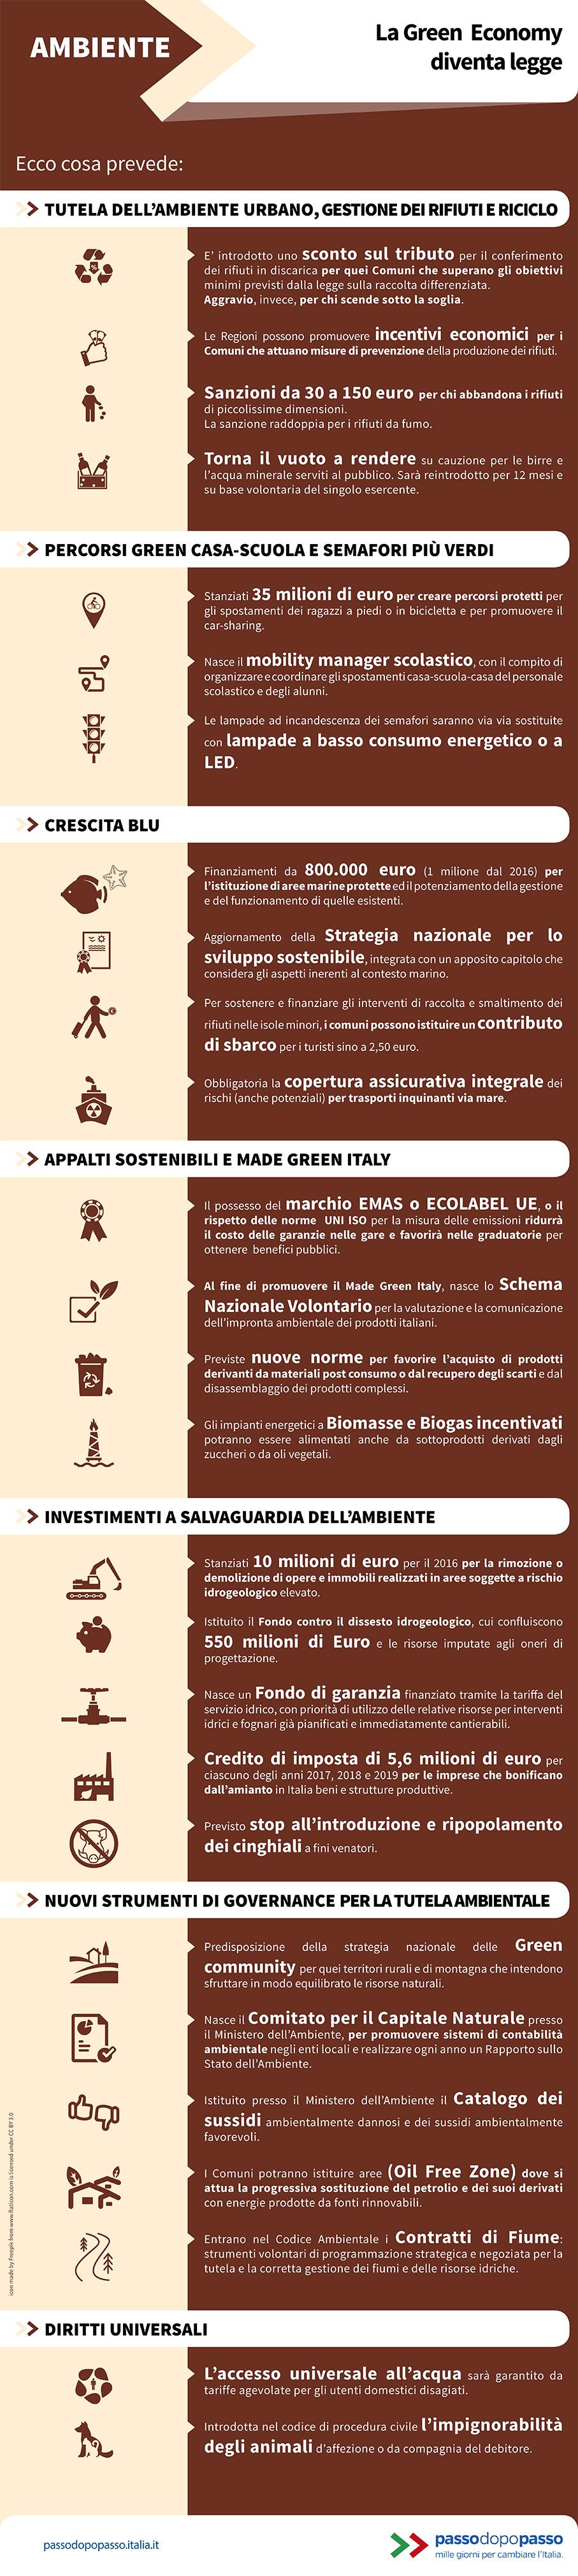 Infografica: La Green  Economy diventa legge